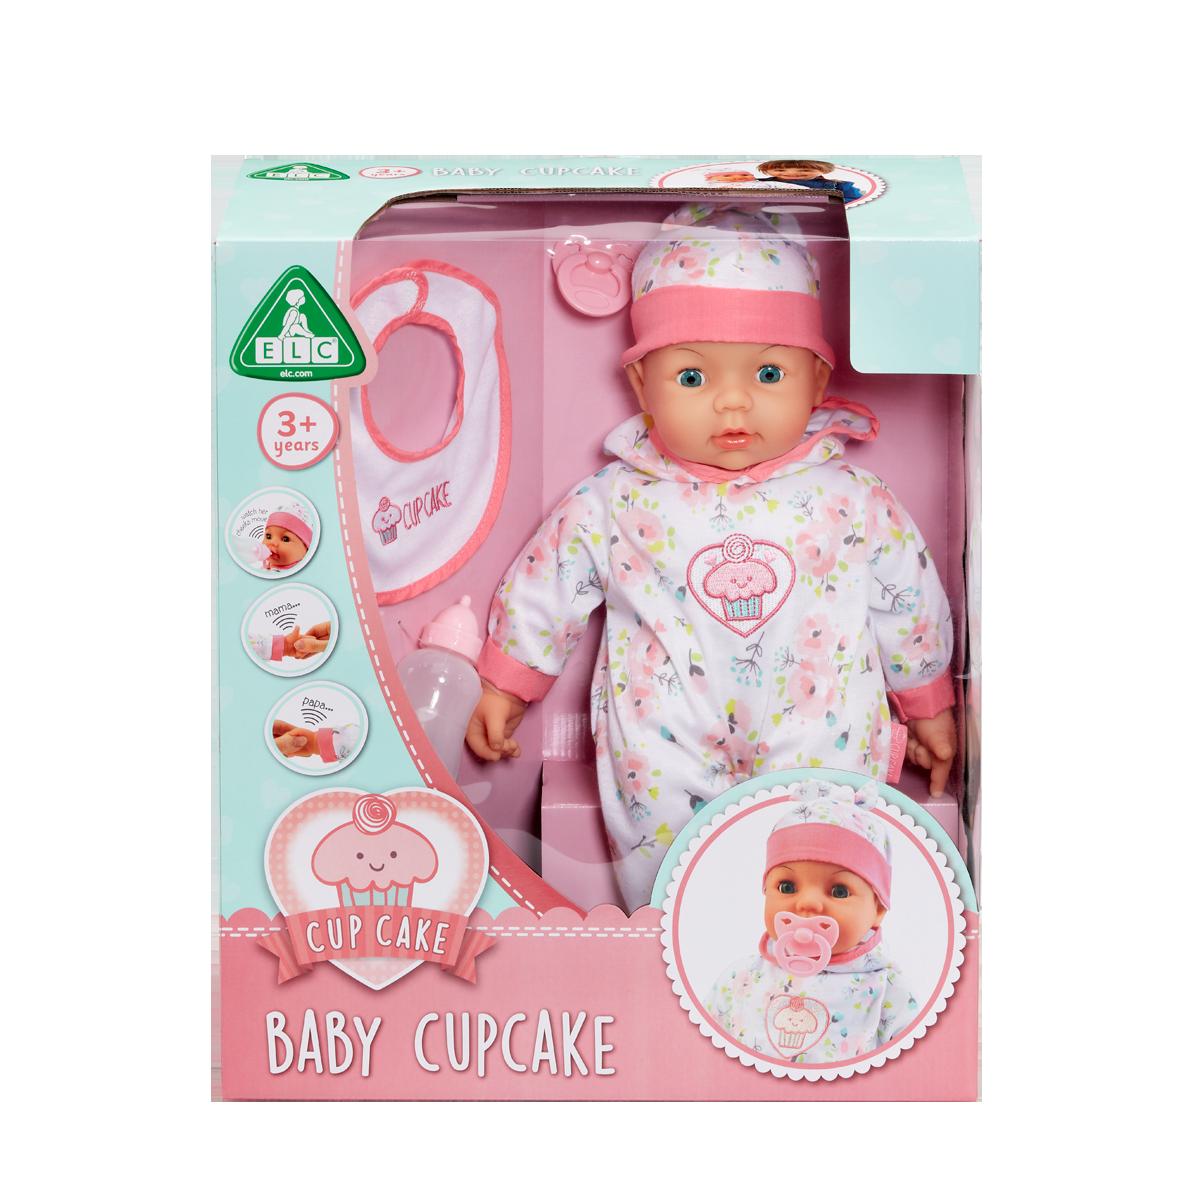 Cupcake Baby Cupcake